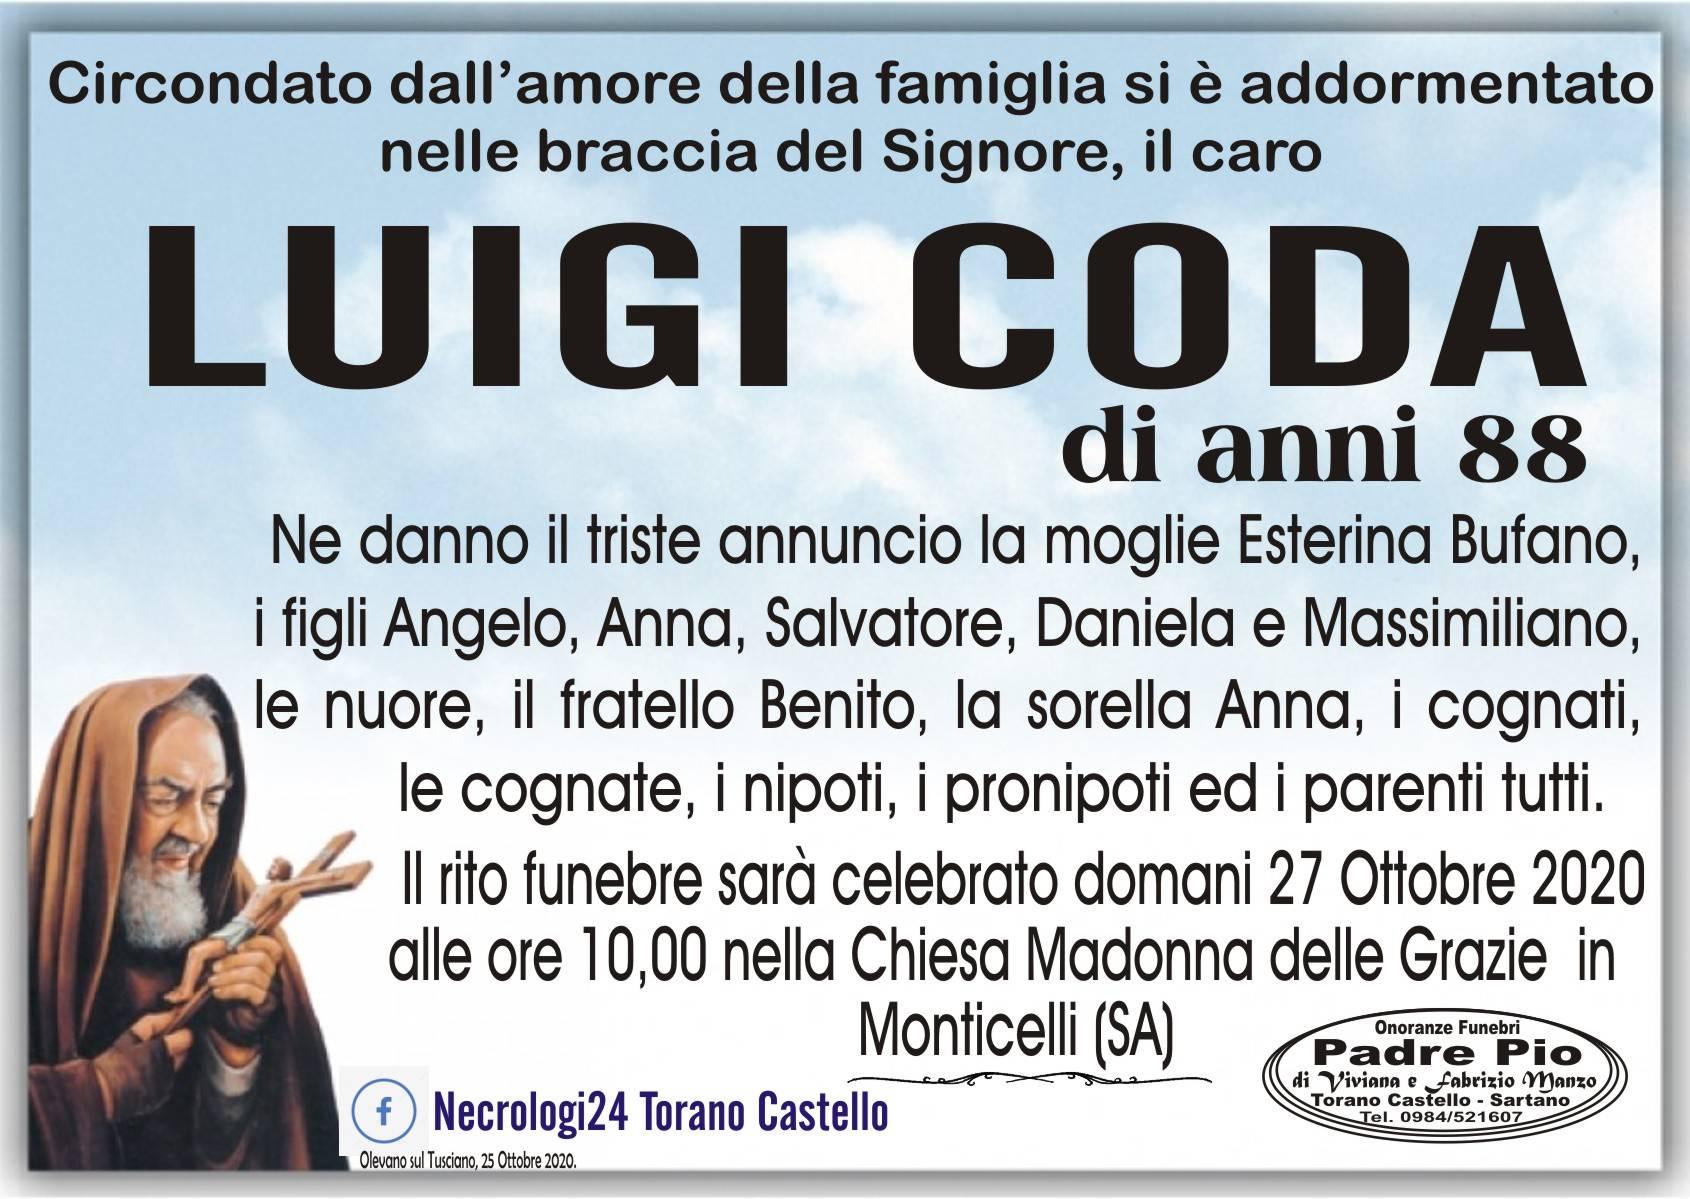 Luigi Coda